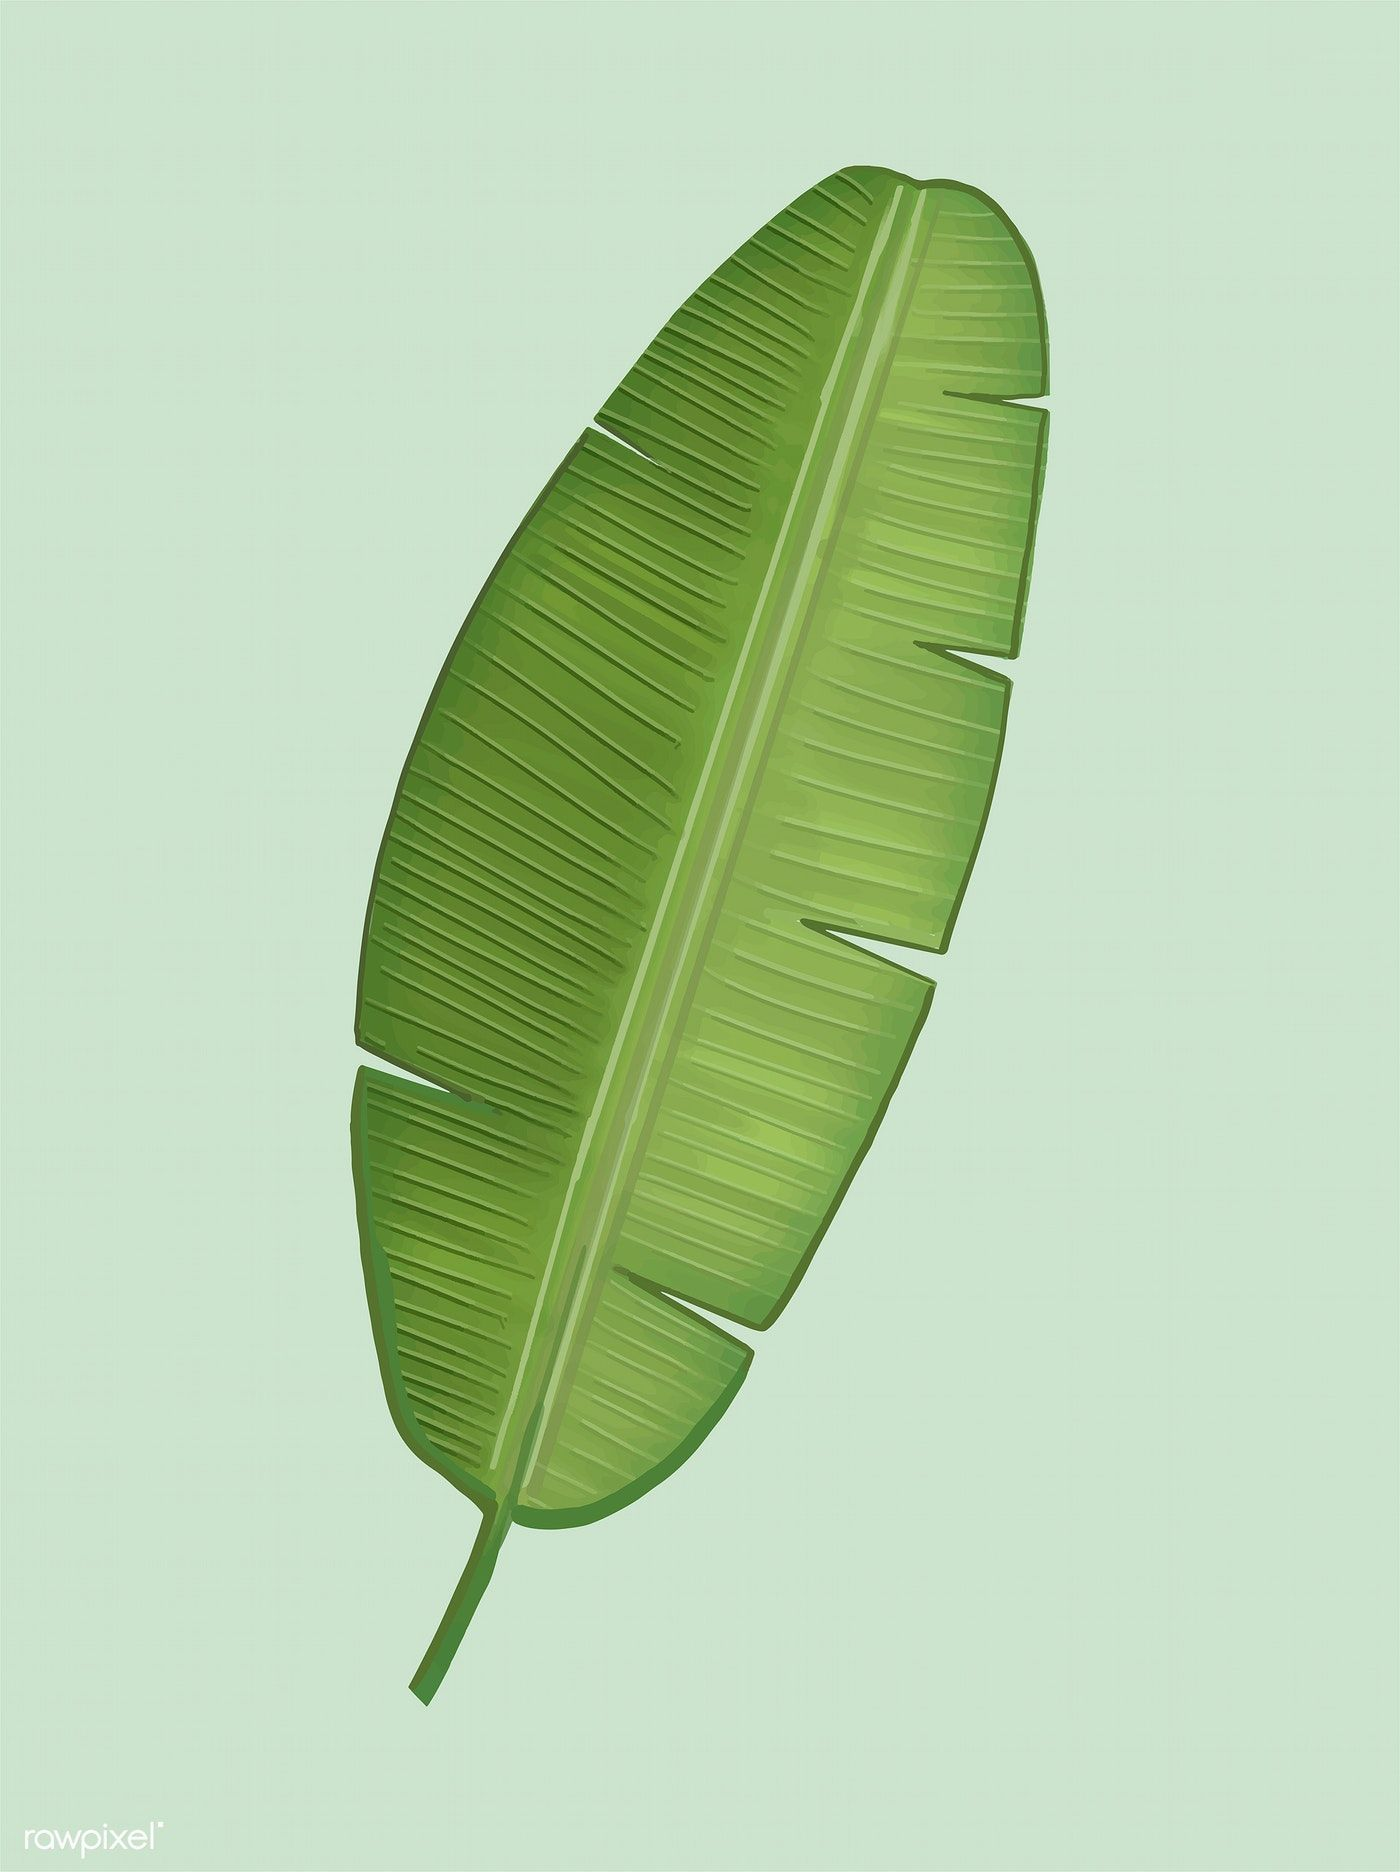 Tropical Green Banana Leaf Illustration Free Image By Rawpixel Com Leaf Illustration Banana Leaves Image Banana Leaf